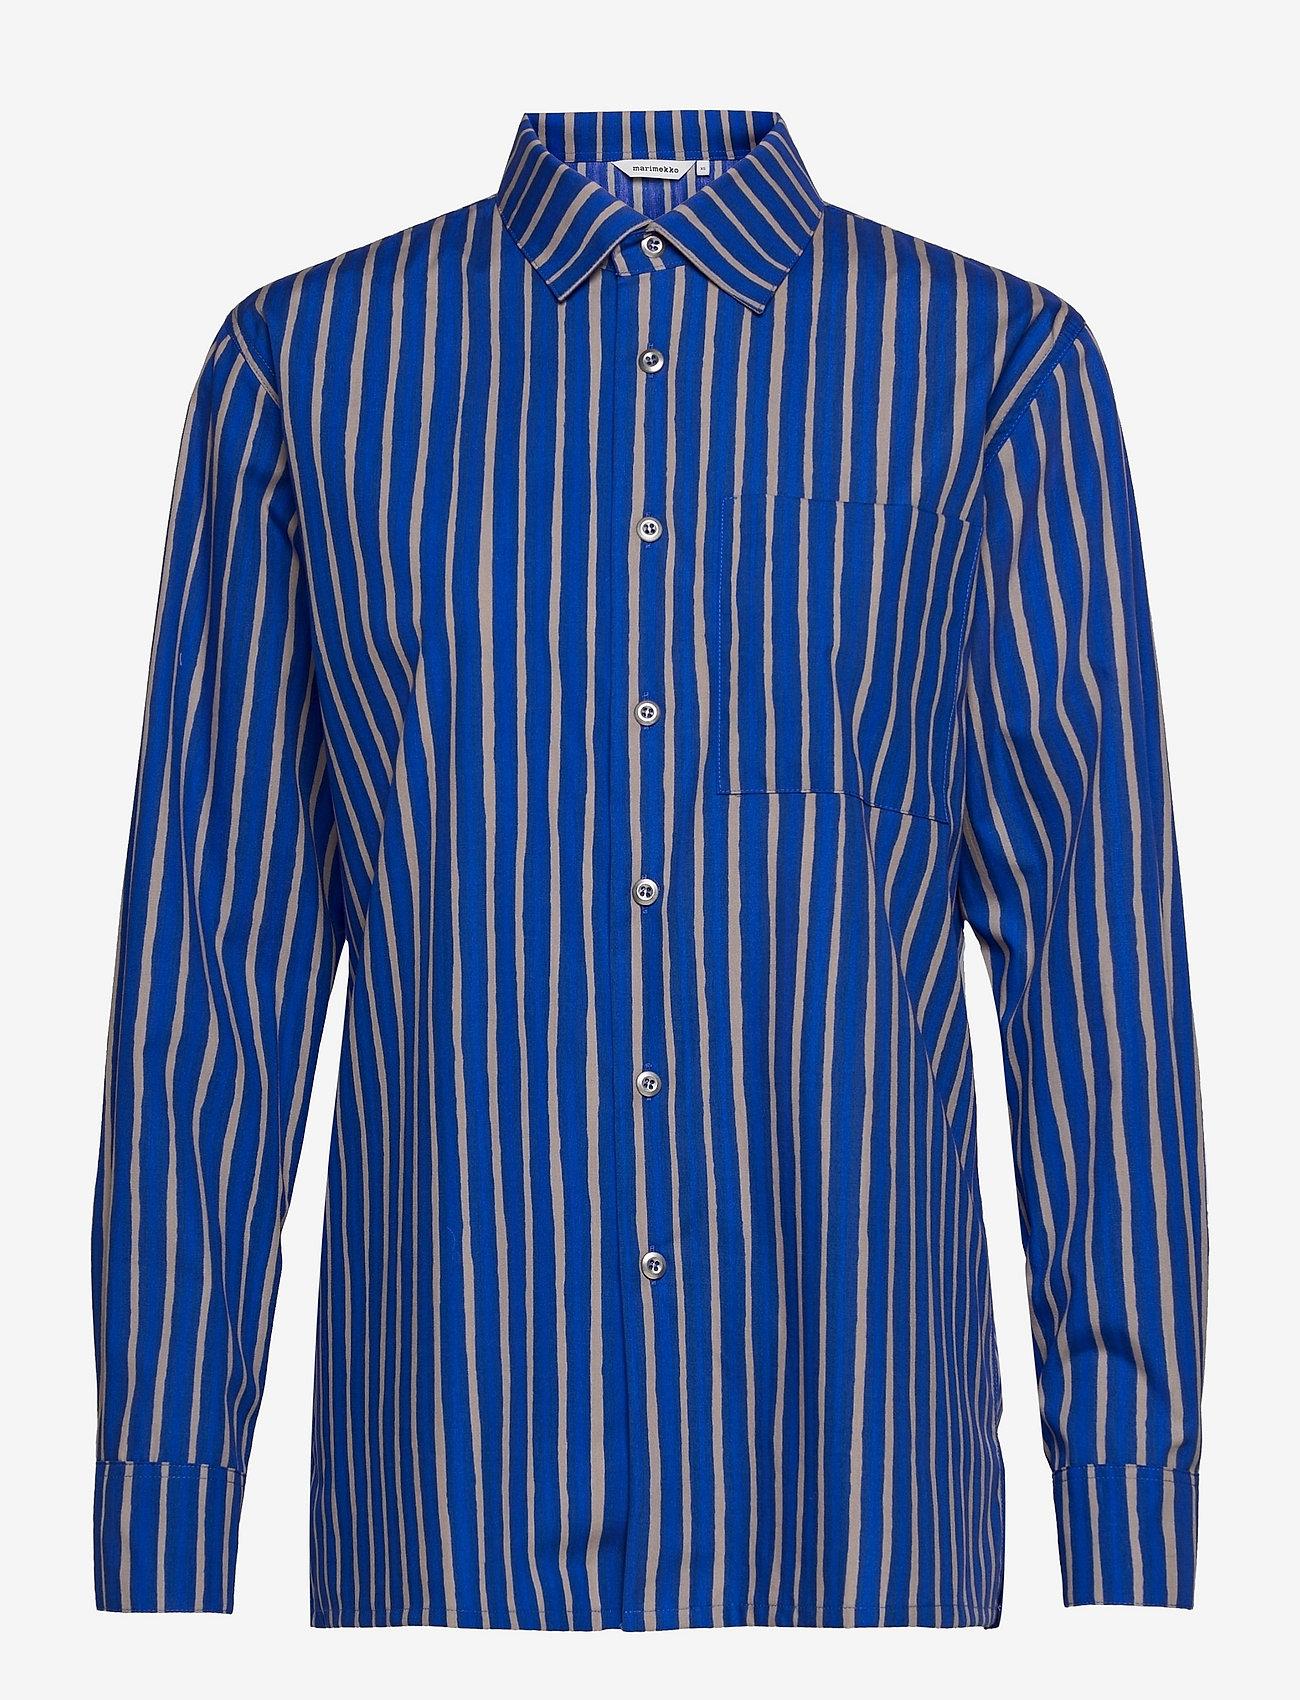 Marimekko - JOKAPOIKA 2017 SHIRT - langærmede skjorter - blue, sand - 0